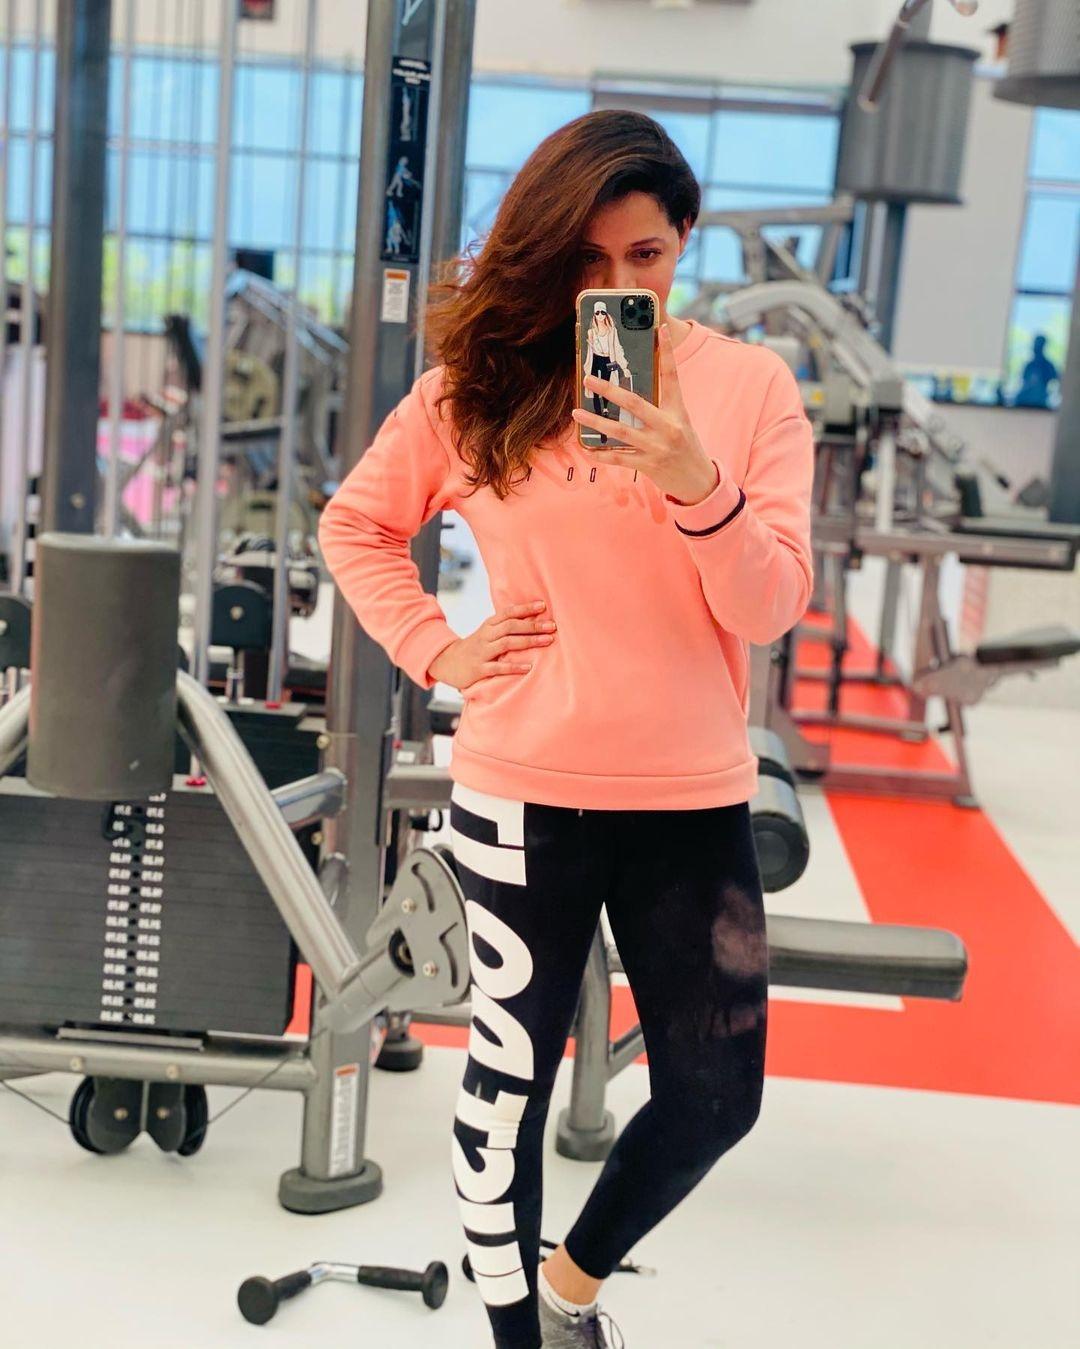 Bhavna weight loss